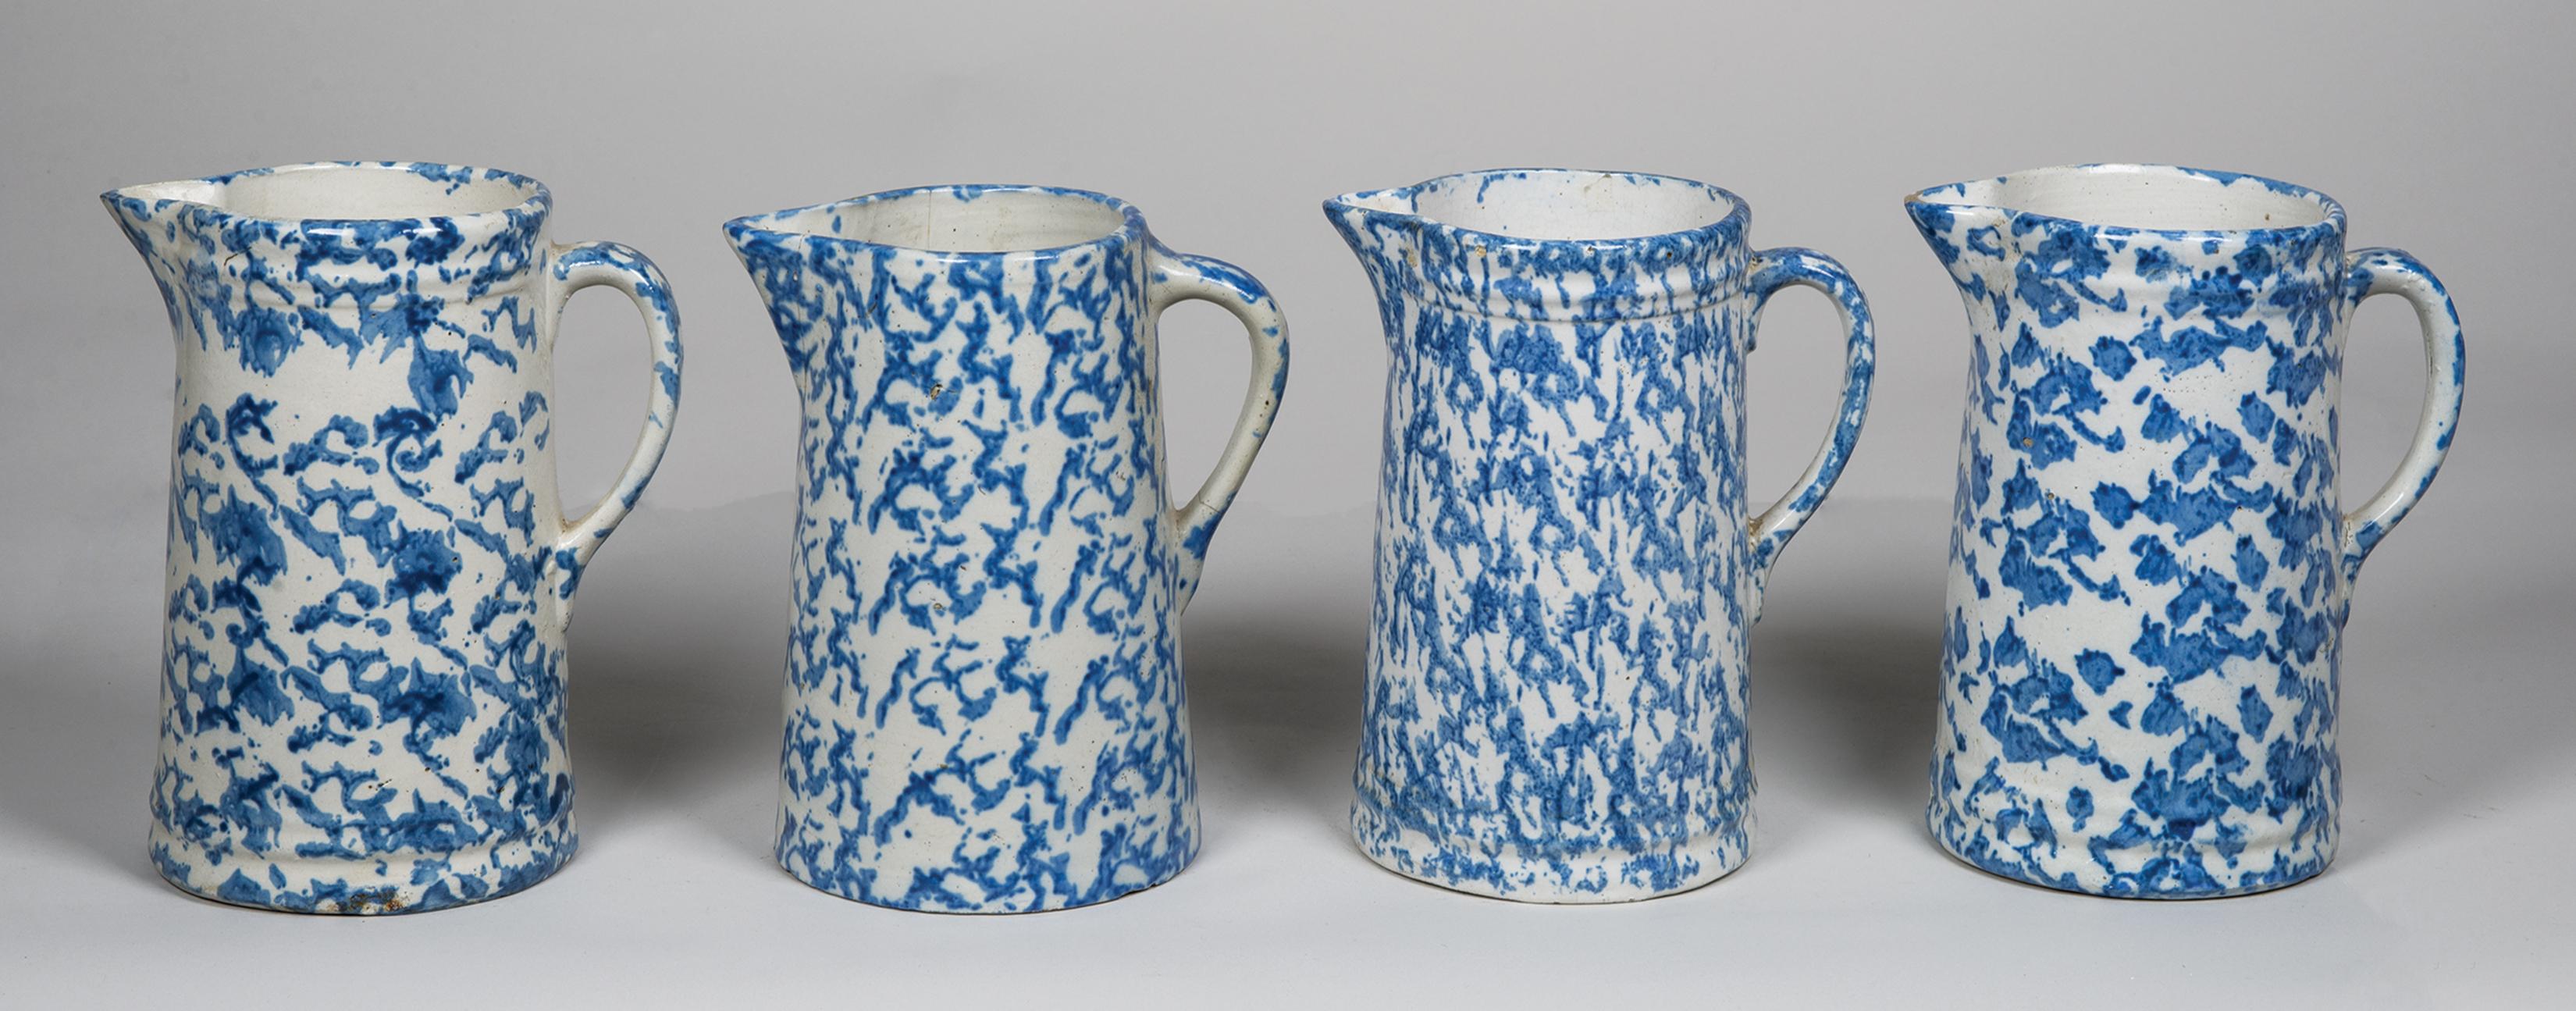 spongeware, pitchers